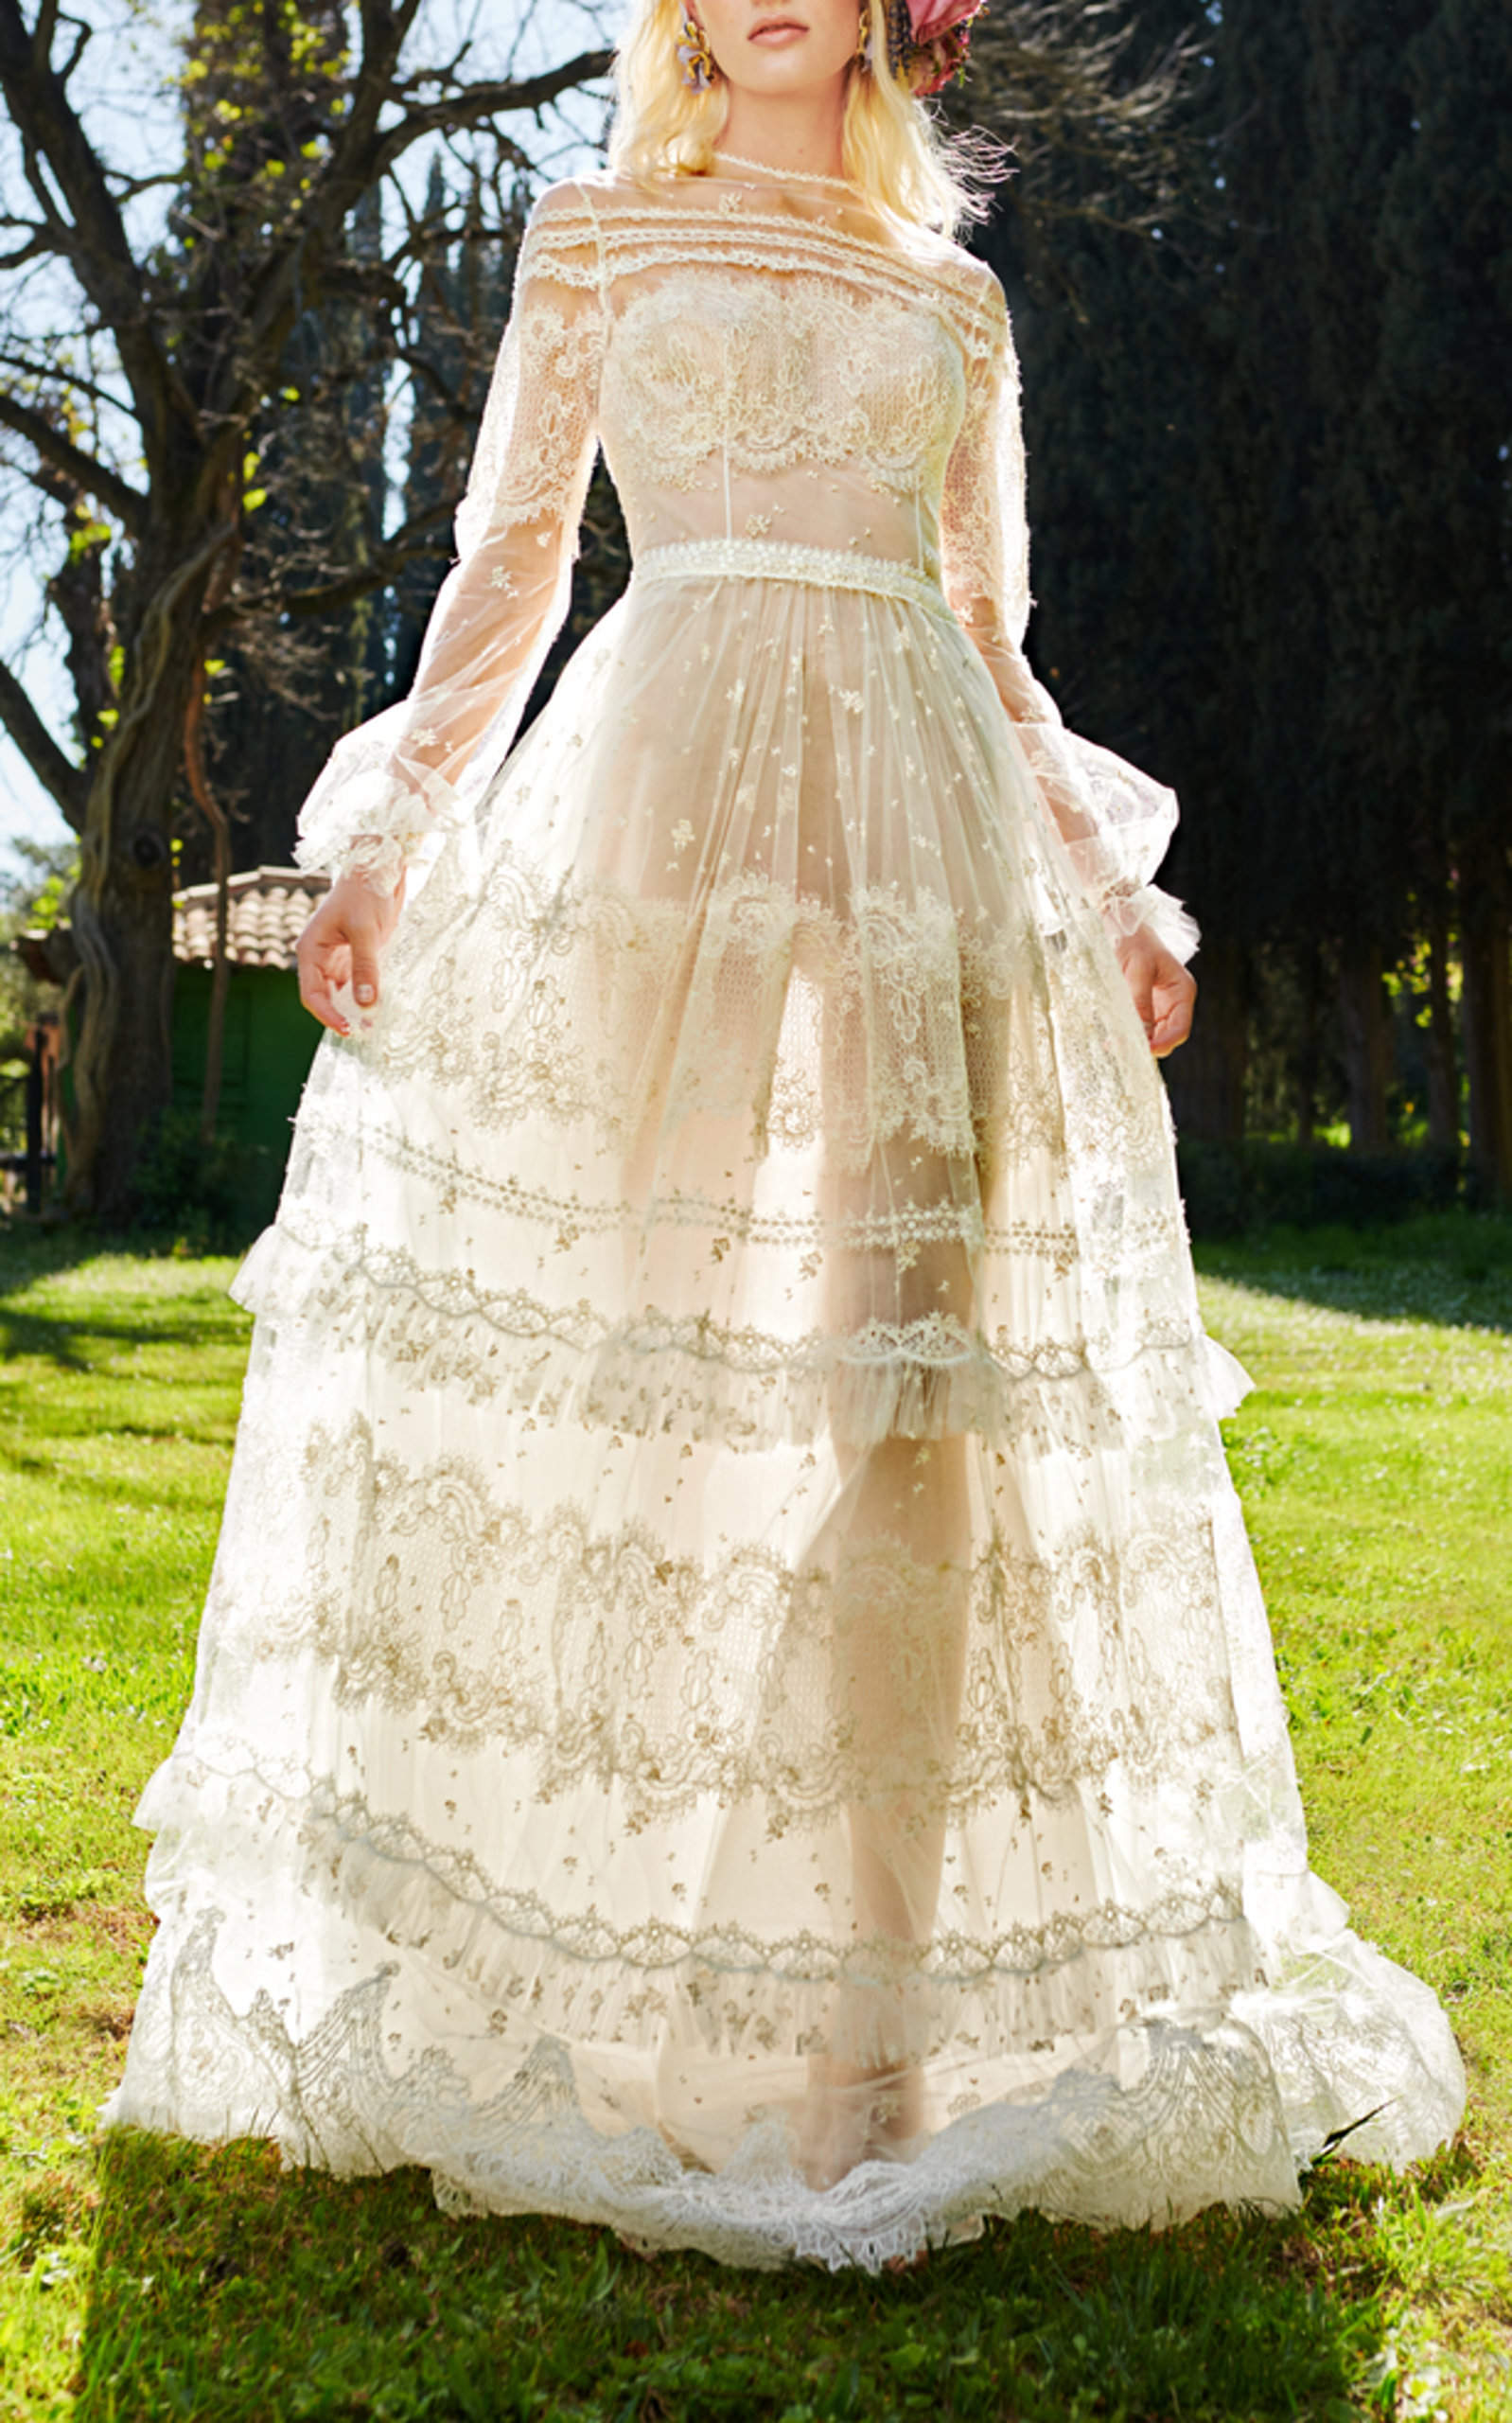 COSTARELLOS BRIDAL ROMANTIC GOSSAMER GOWN